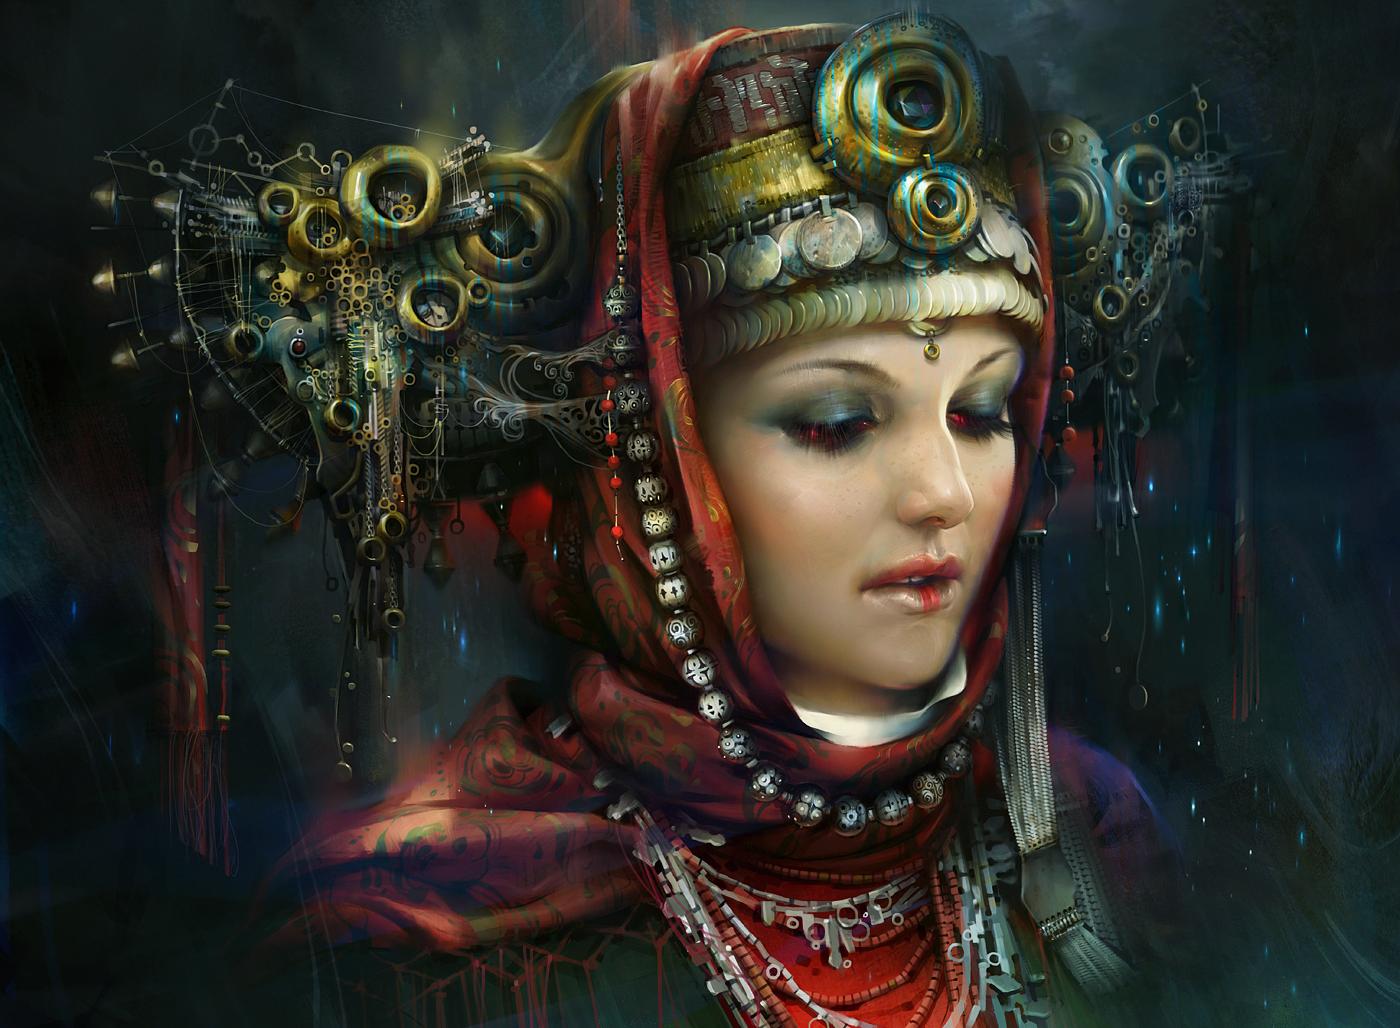 Young Princess by IvanLaliashvili